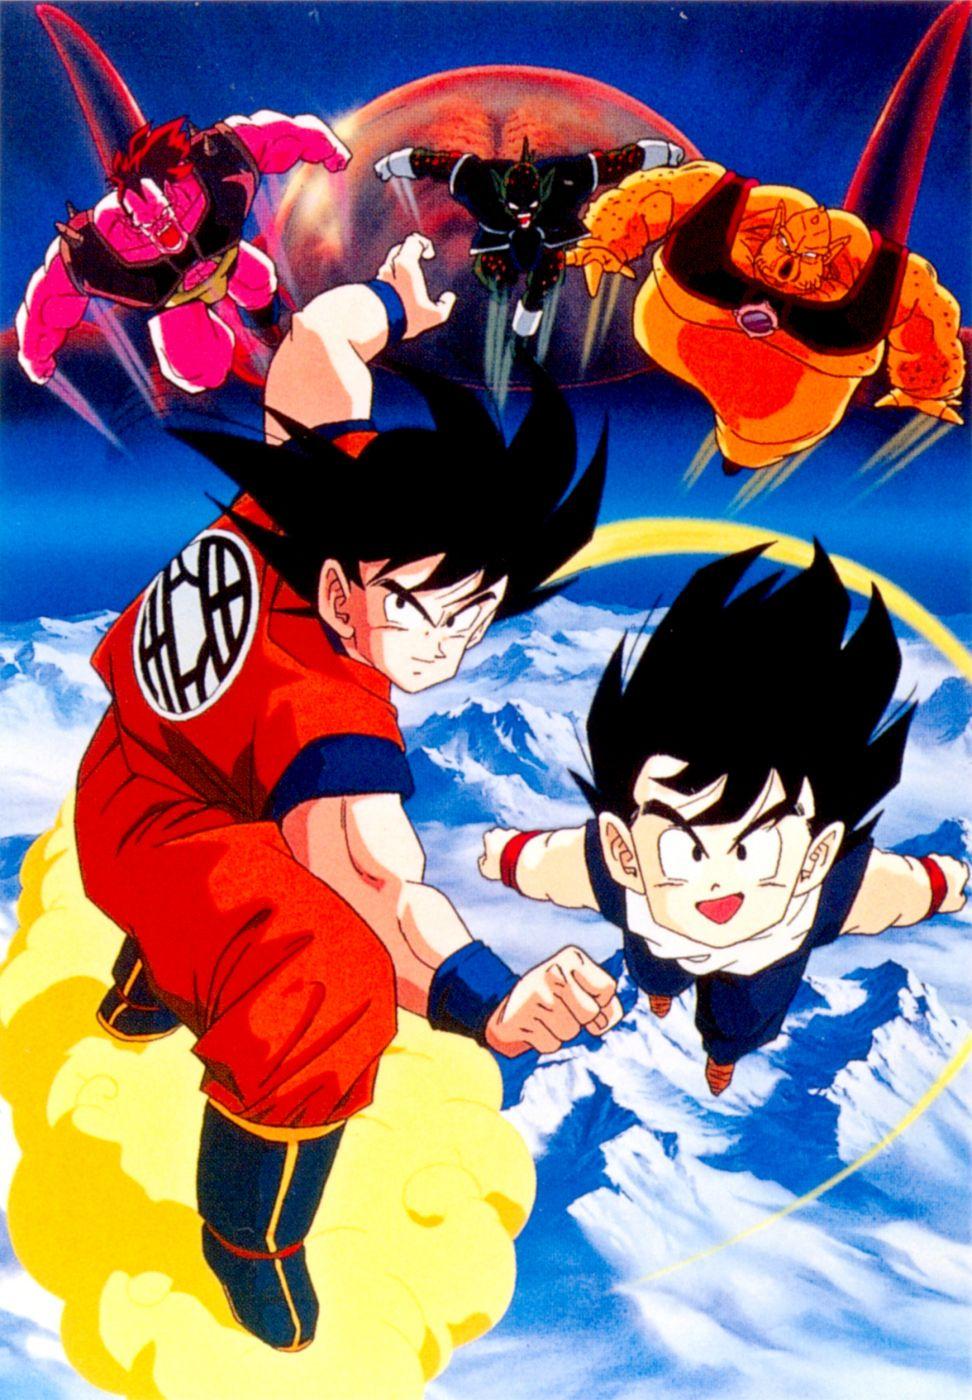 Os Filmes (e OVAs) de Dragon Ball Z – Parte 1